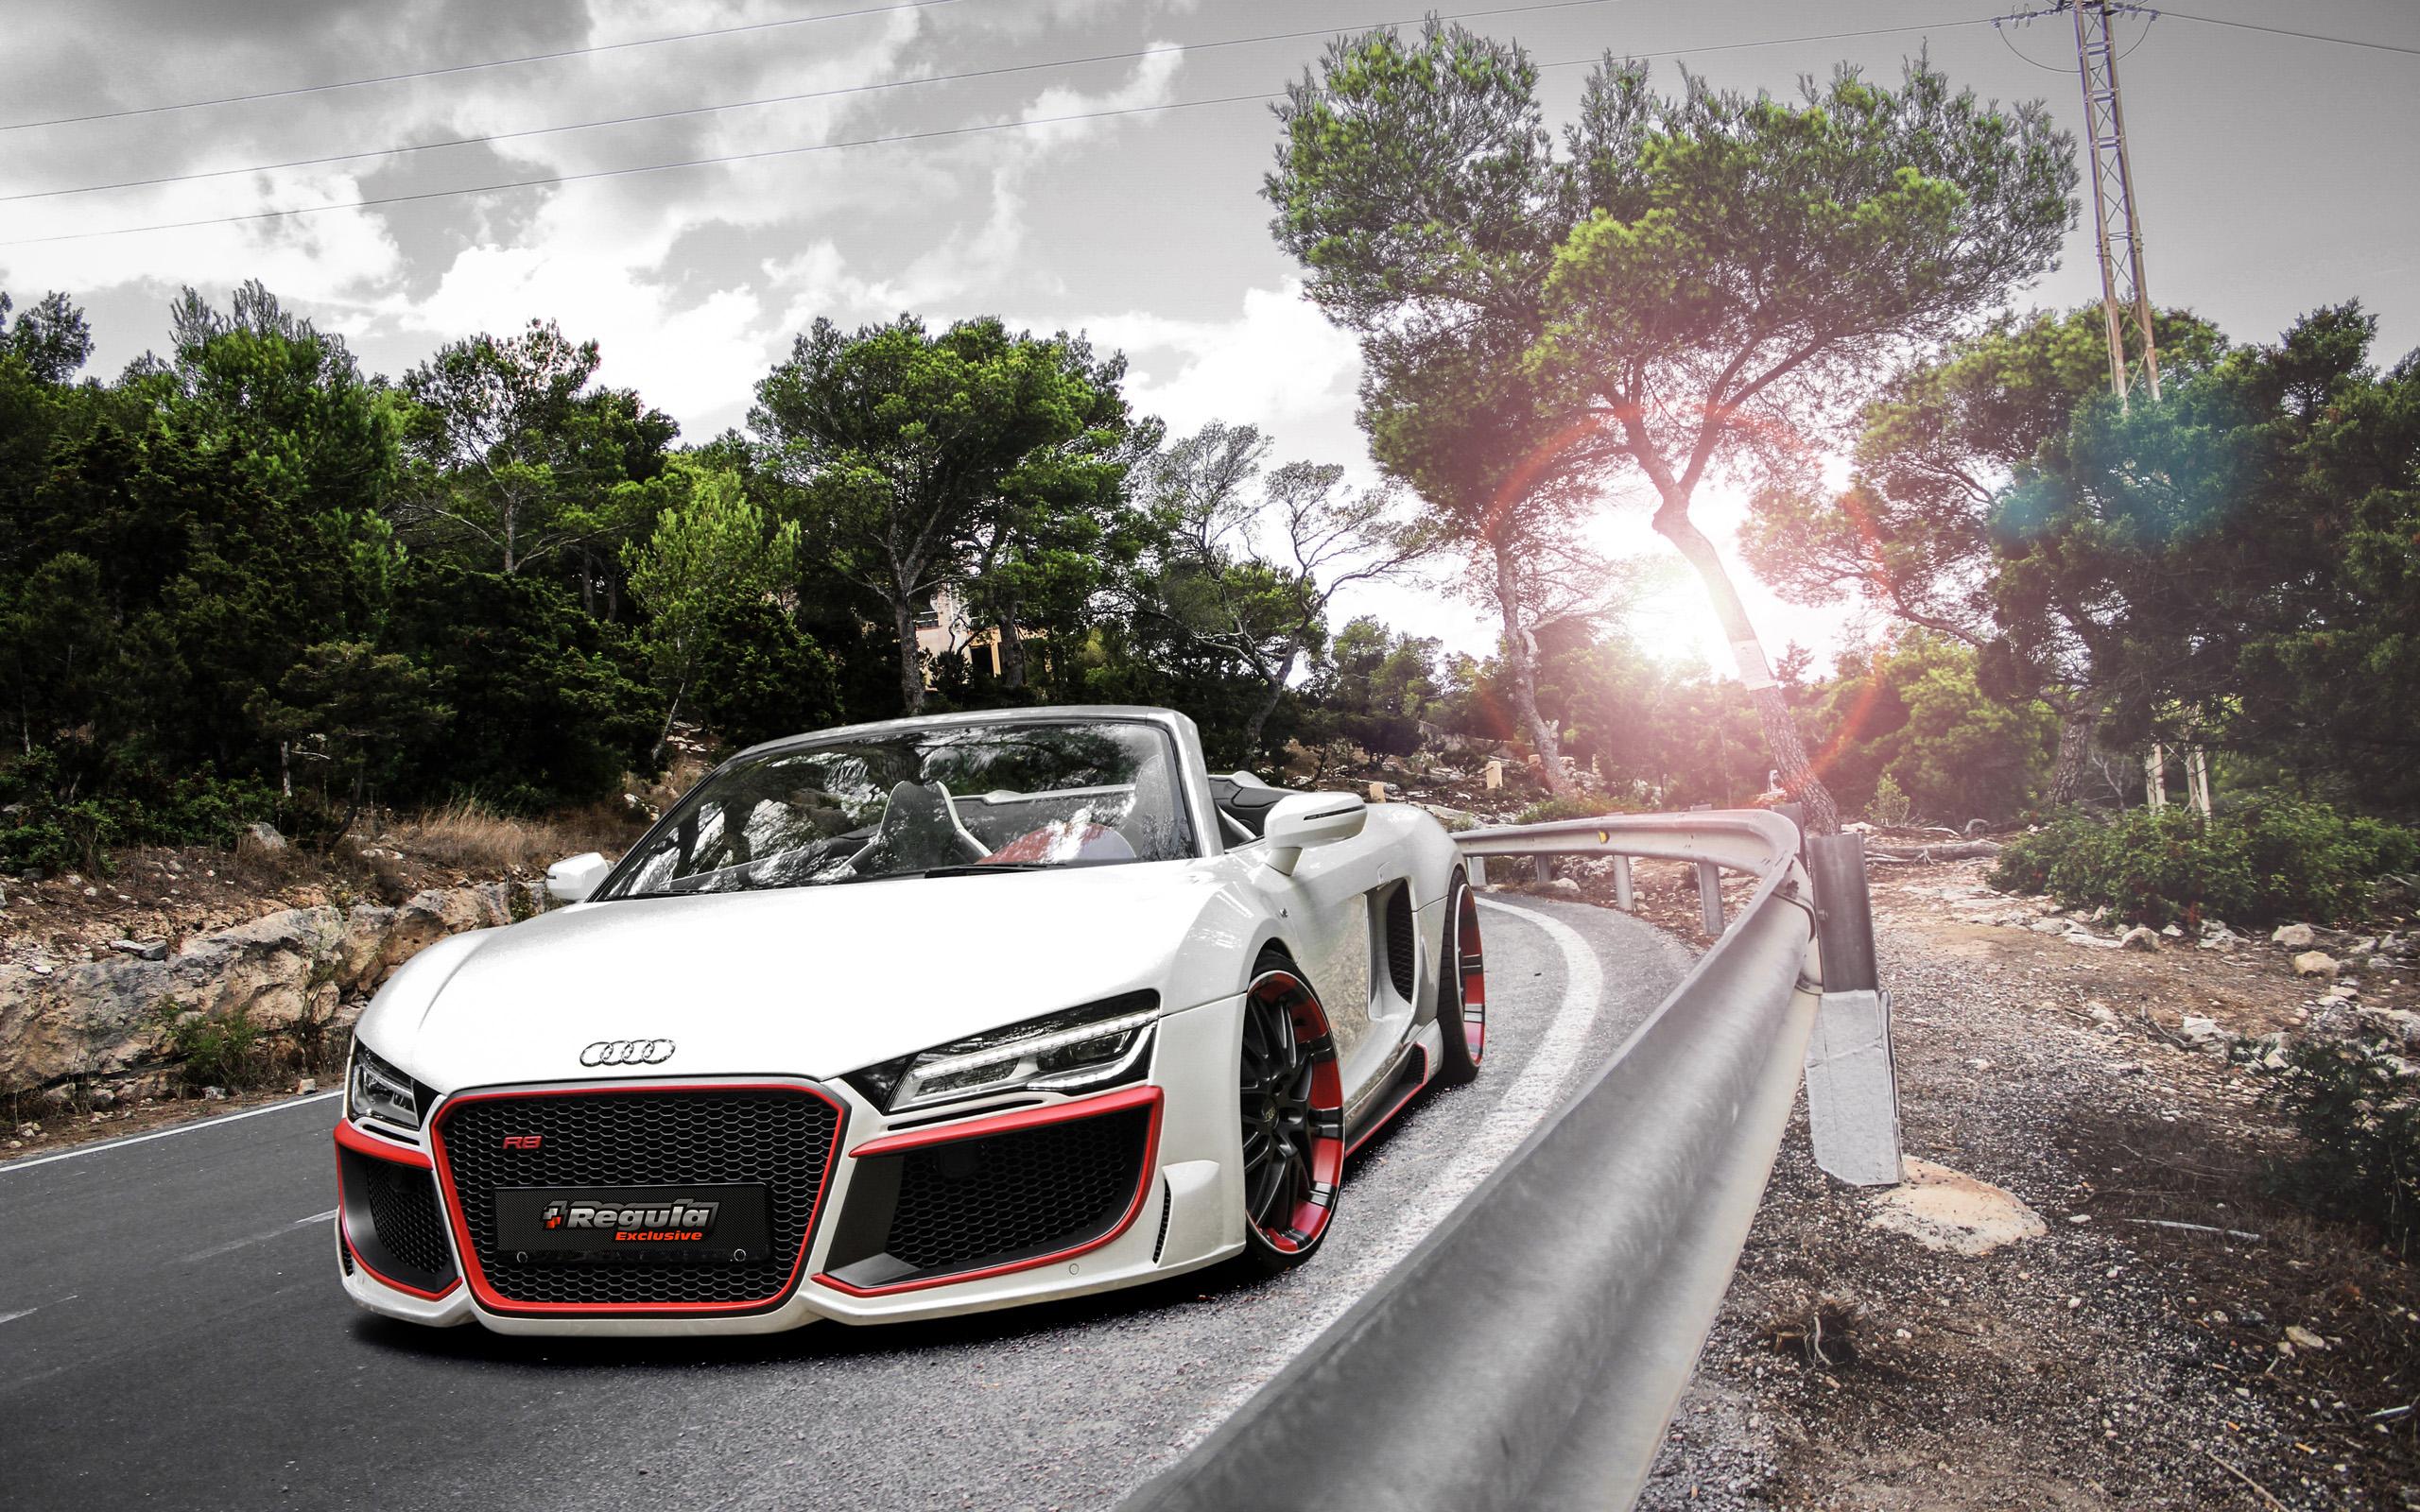 2014 Audi R8 V10 Spyder Regula Tuning Wallpapers HD Wallpapers 2560x1600